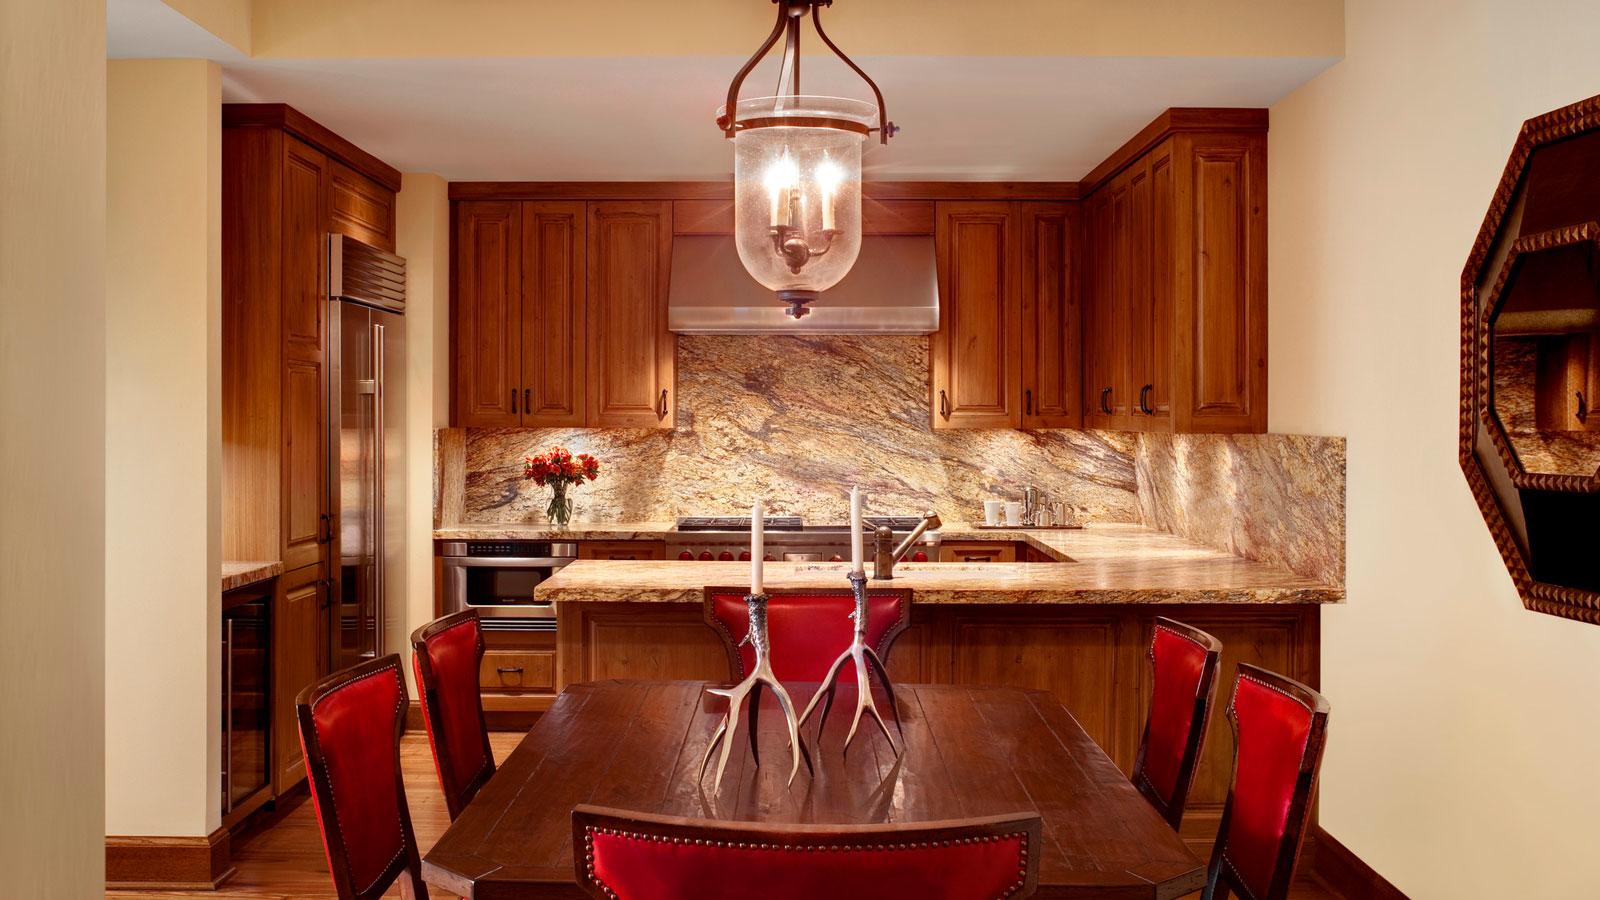 USA-Utah-Deer Valley-St. Regis Madison Kitchen.jpg